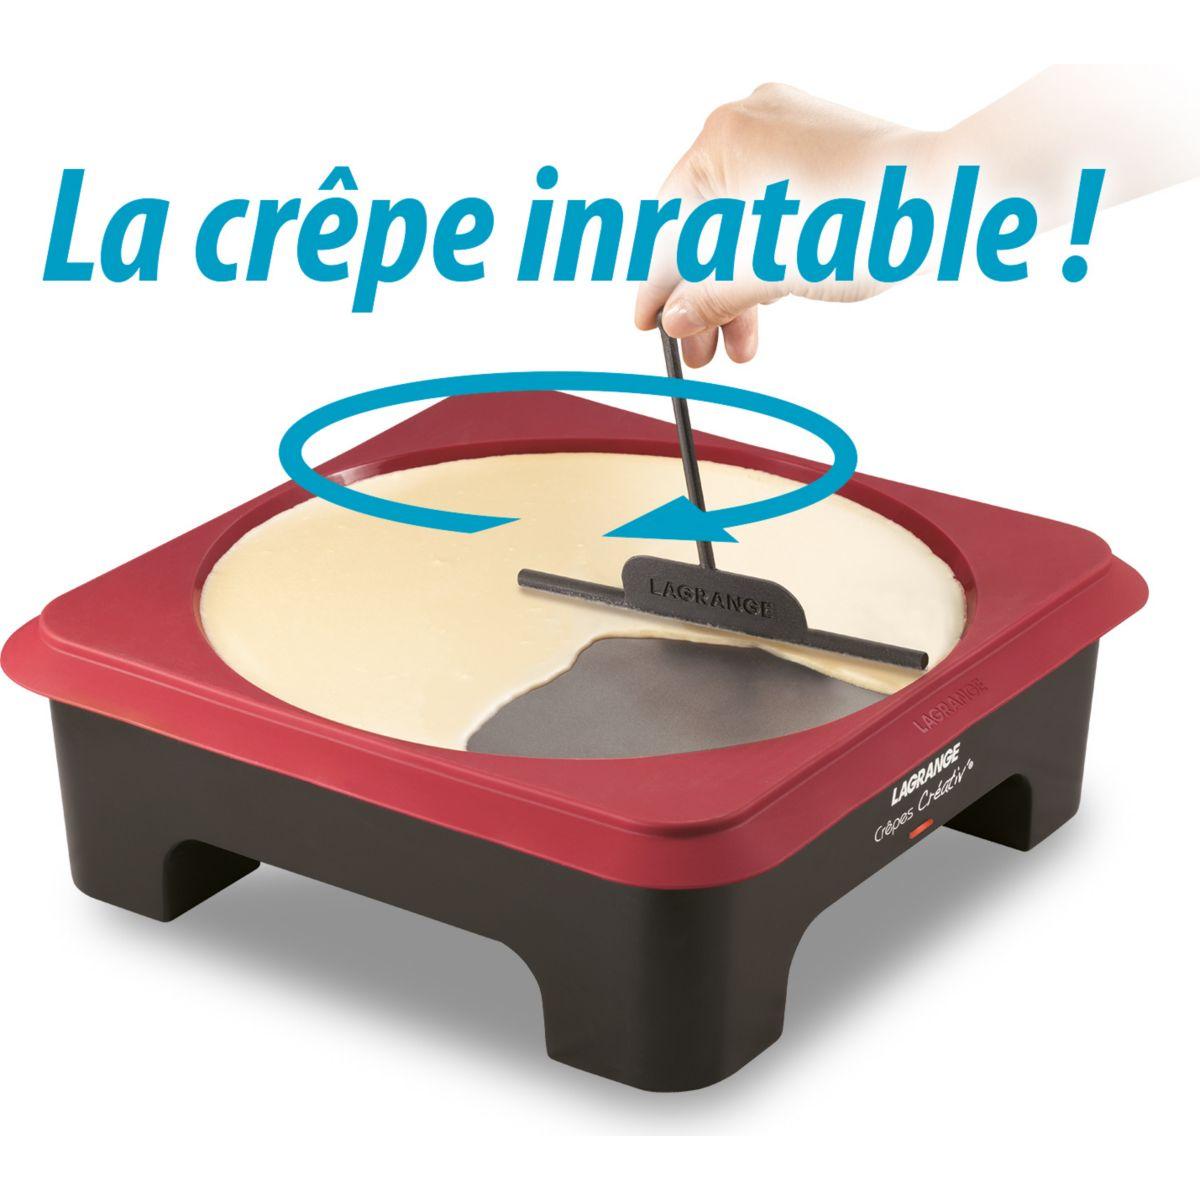 Cr�pe party lagrange crepes creativ 3 pochoirs (photo)